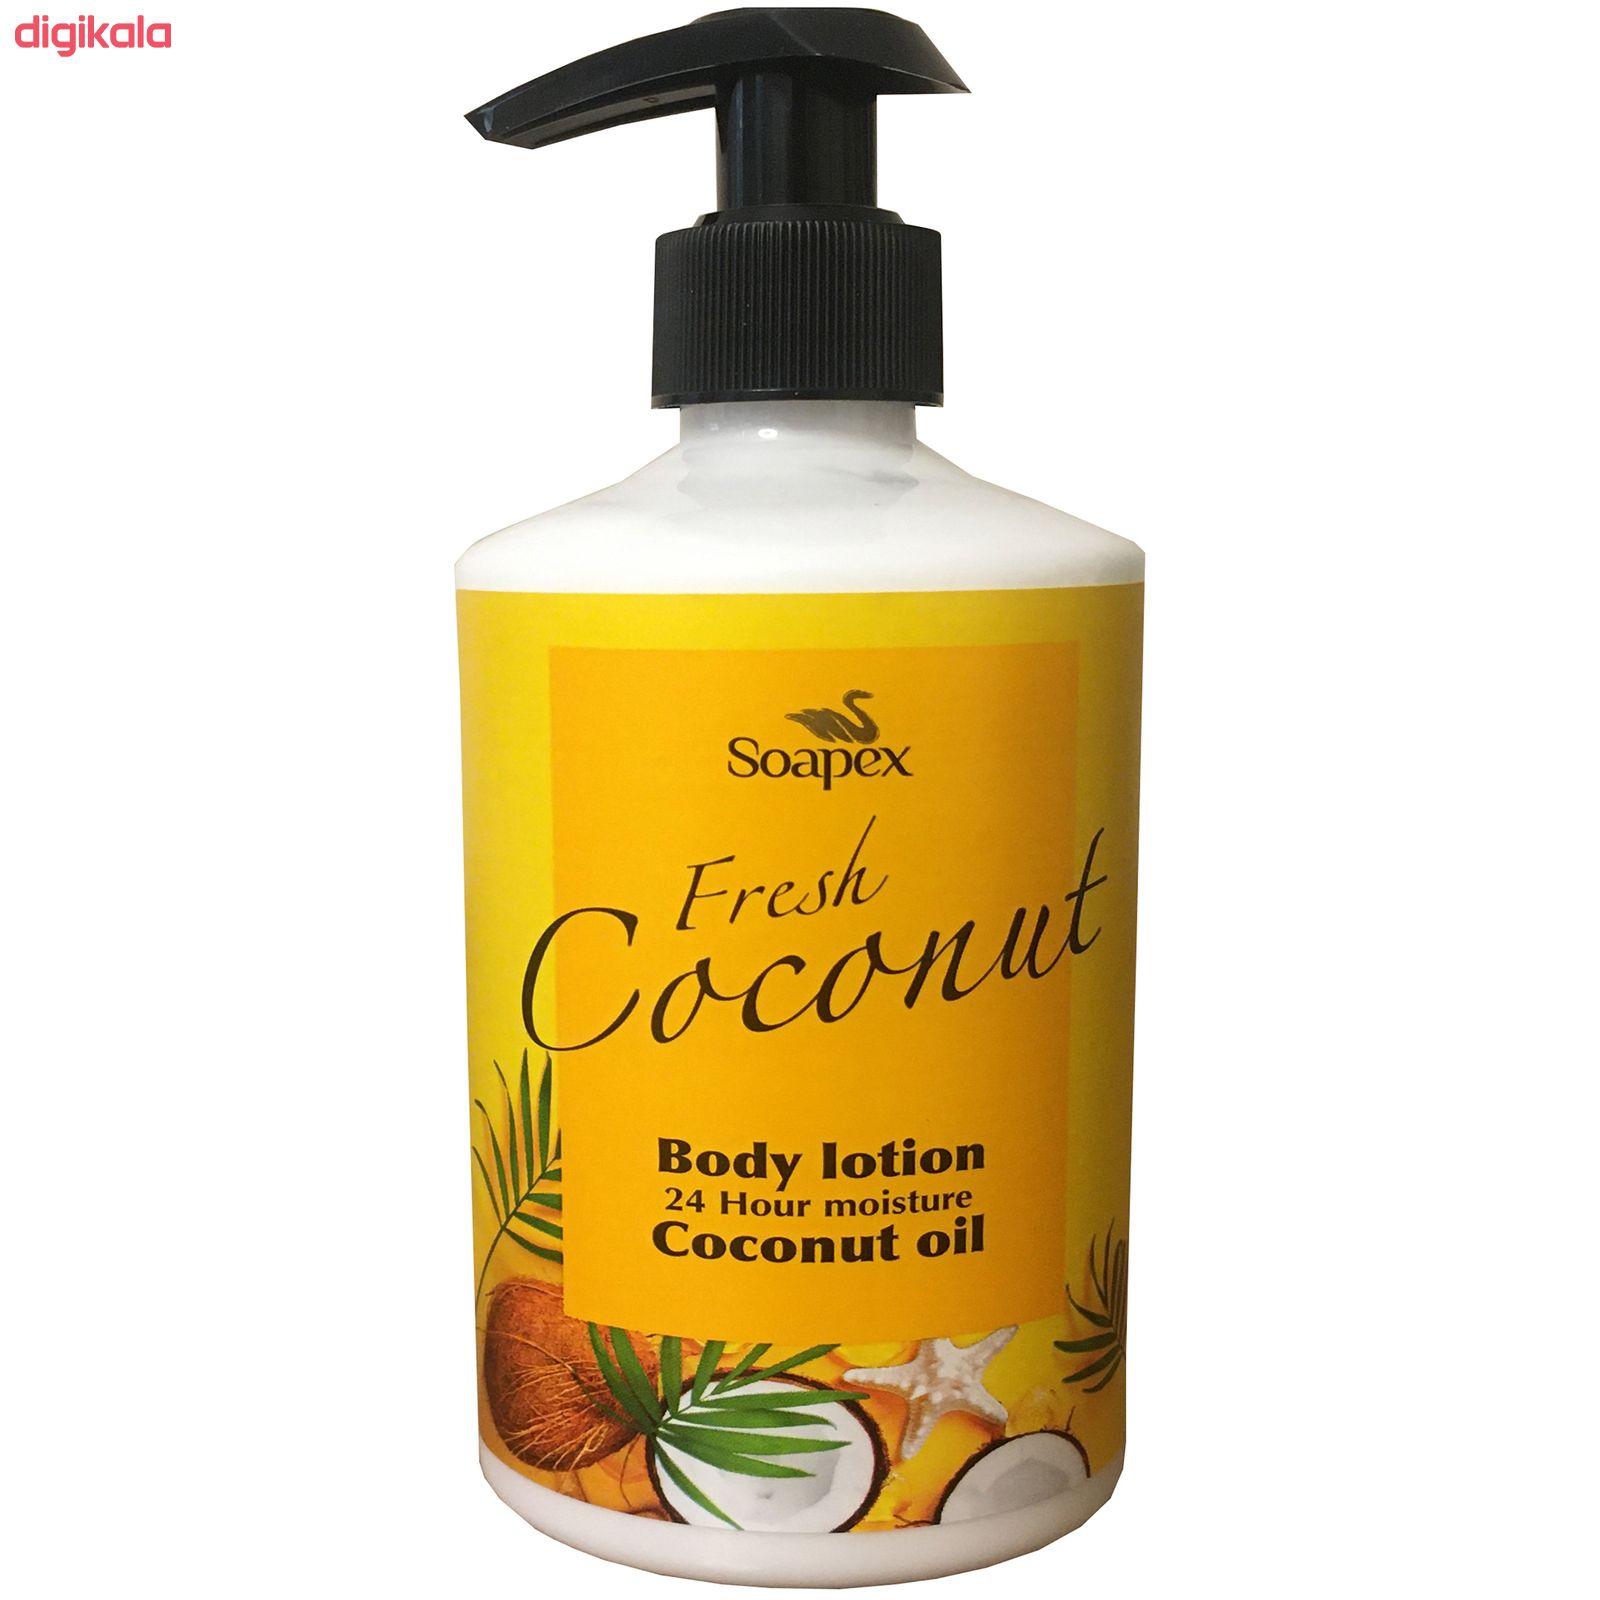 لوسیون بدن سوپکس مدل Coconut oil حجم 350 میلی لیتر main 1 1